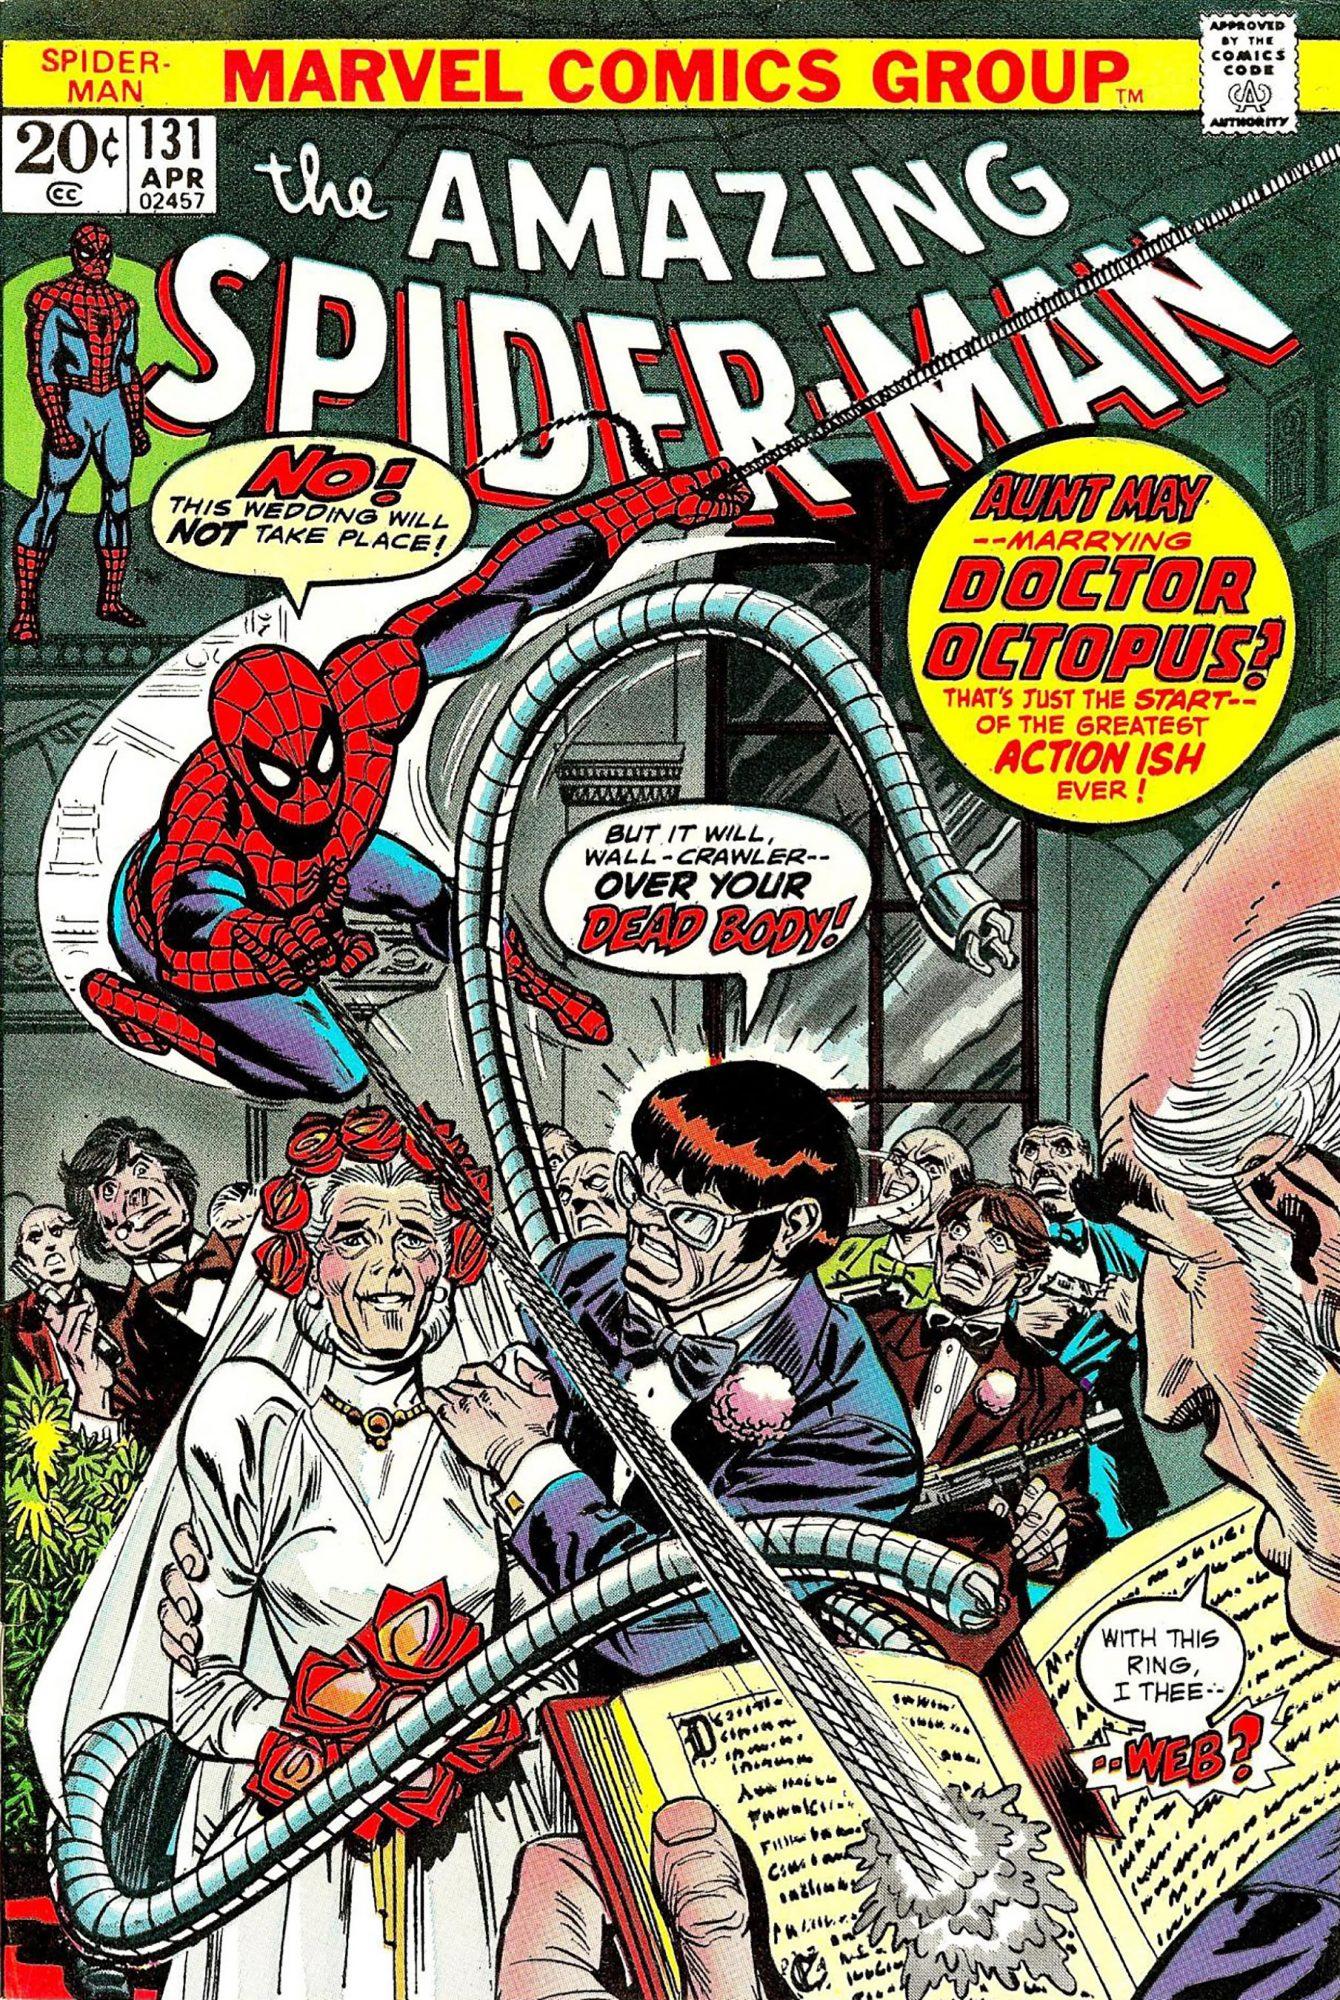 Amazing Spider-Man #131Artist: Gil Kane, 1974